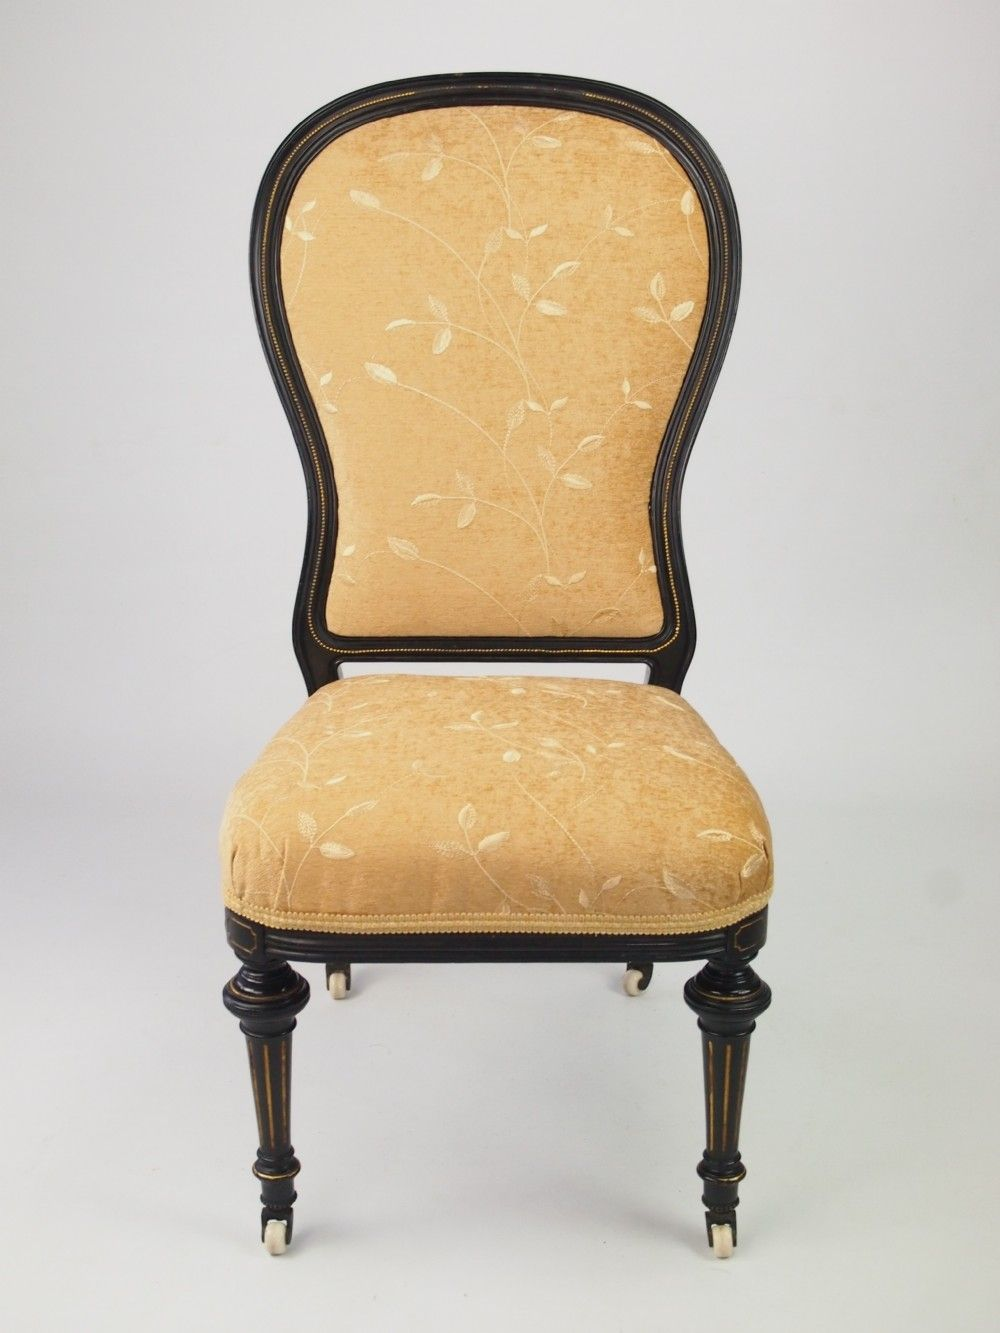 Antique Victorian Aesthetic Movement Balloon Back Chair / Nursing Chair - Antique Victorian Aesthetic Movement Balloon Back Chair / Nursing